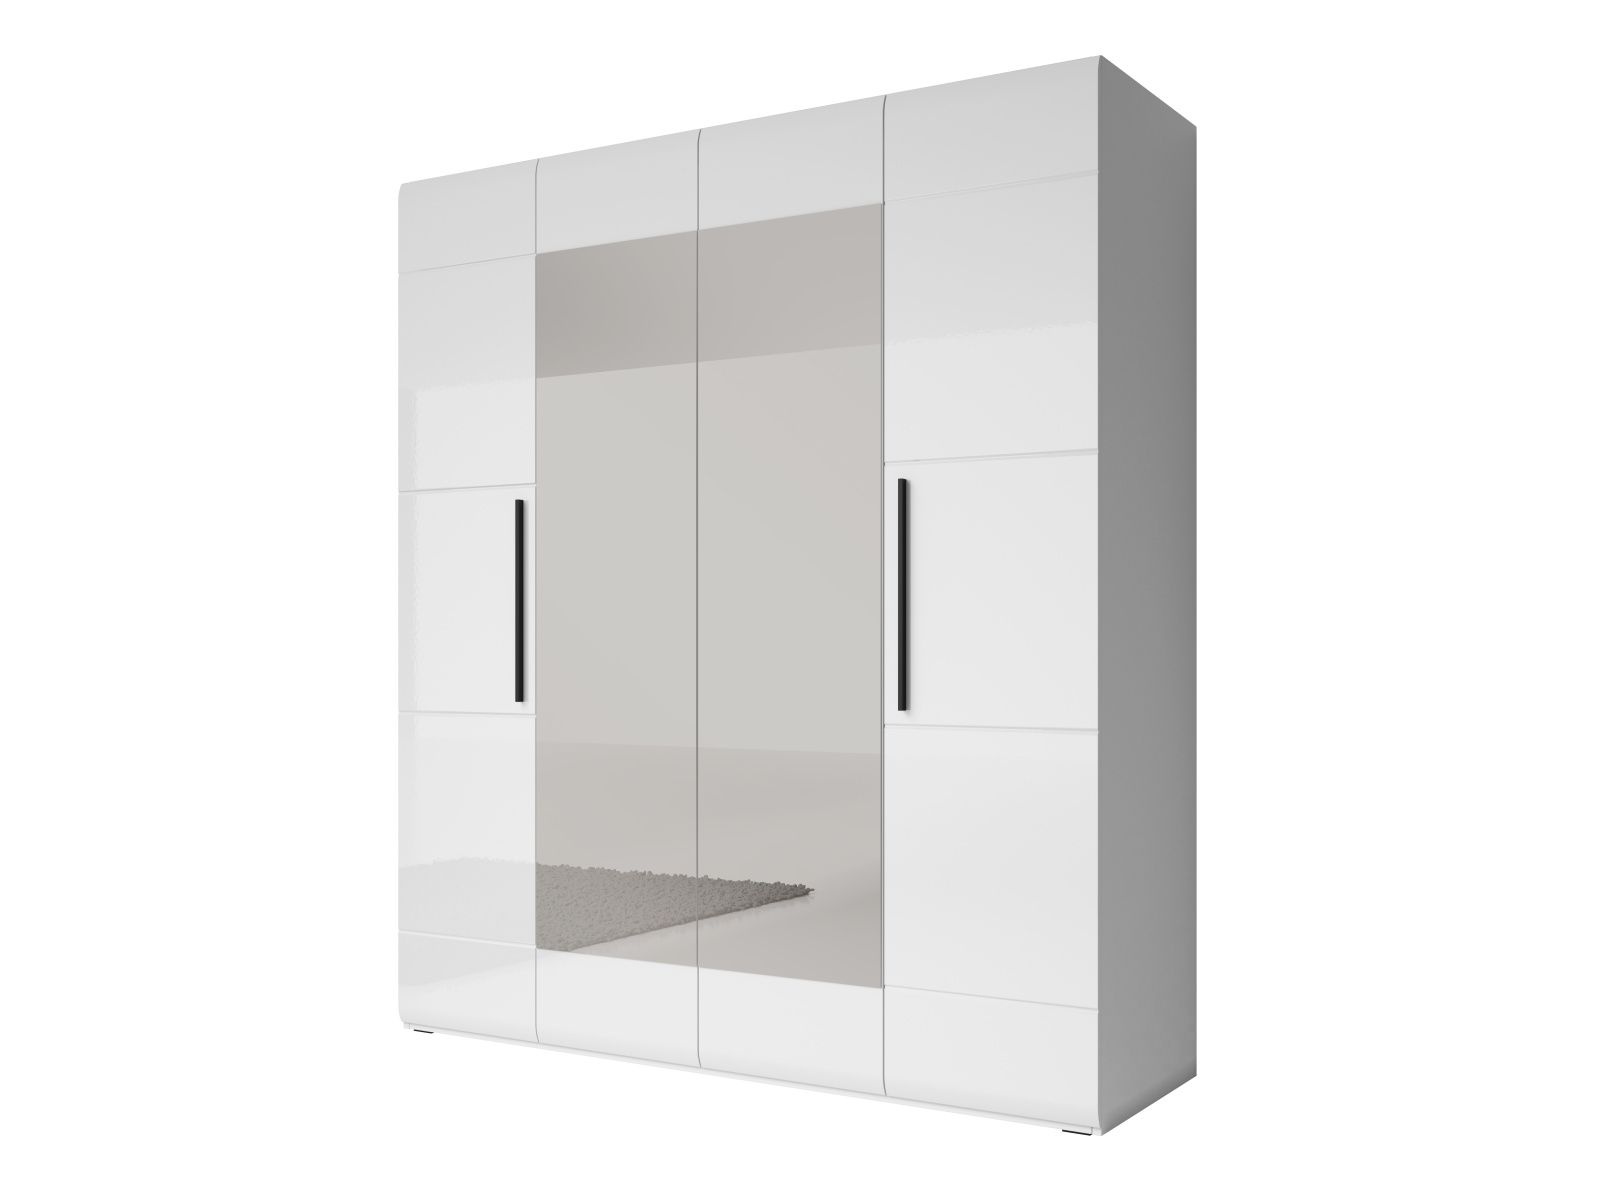 Smartshop HARMONY šatní skříň se zrcadlem 180 TYP 20, bílá/bílý lesk